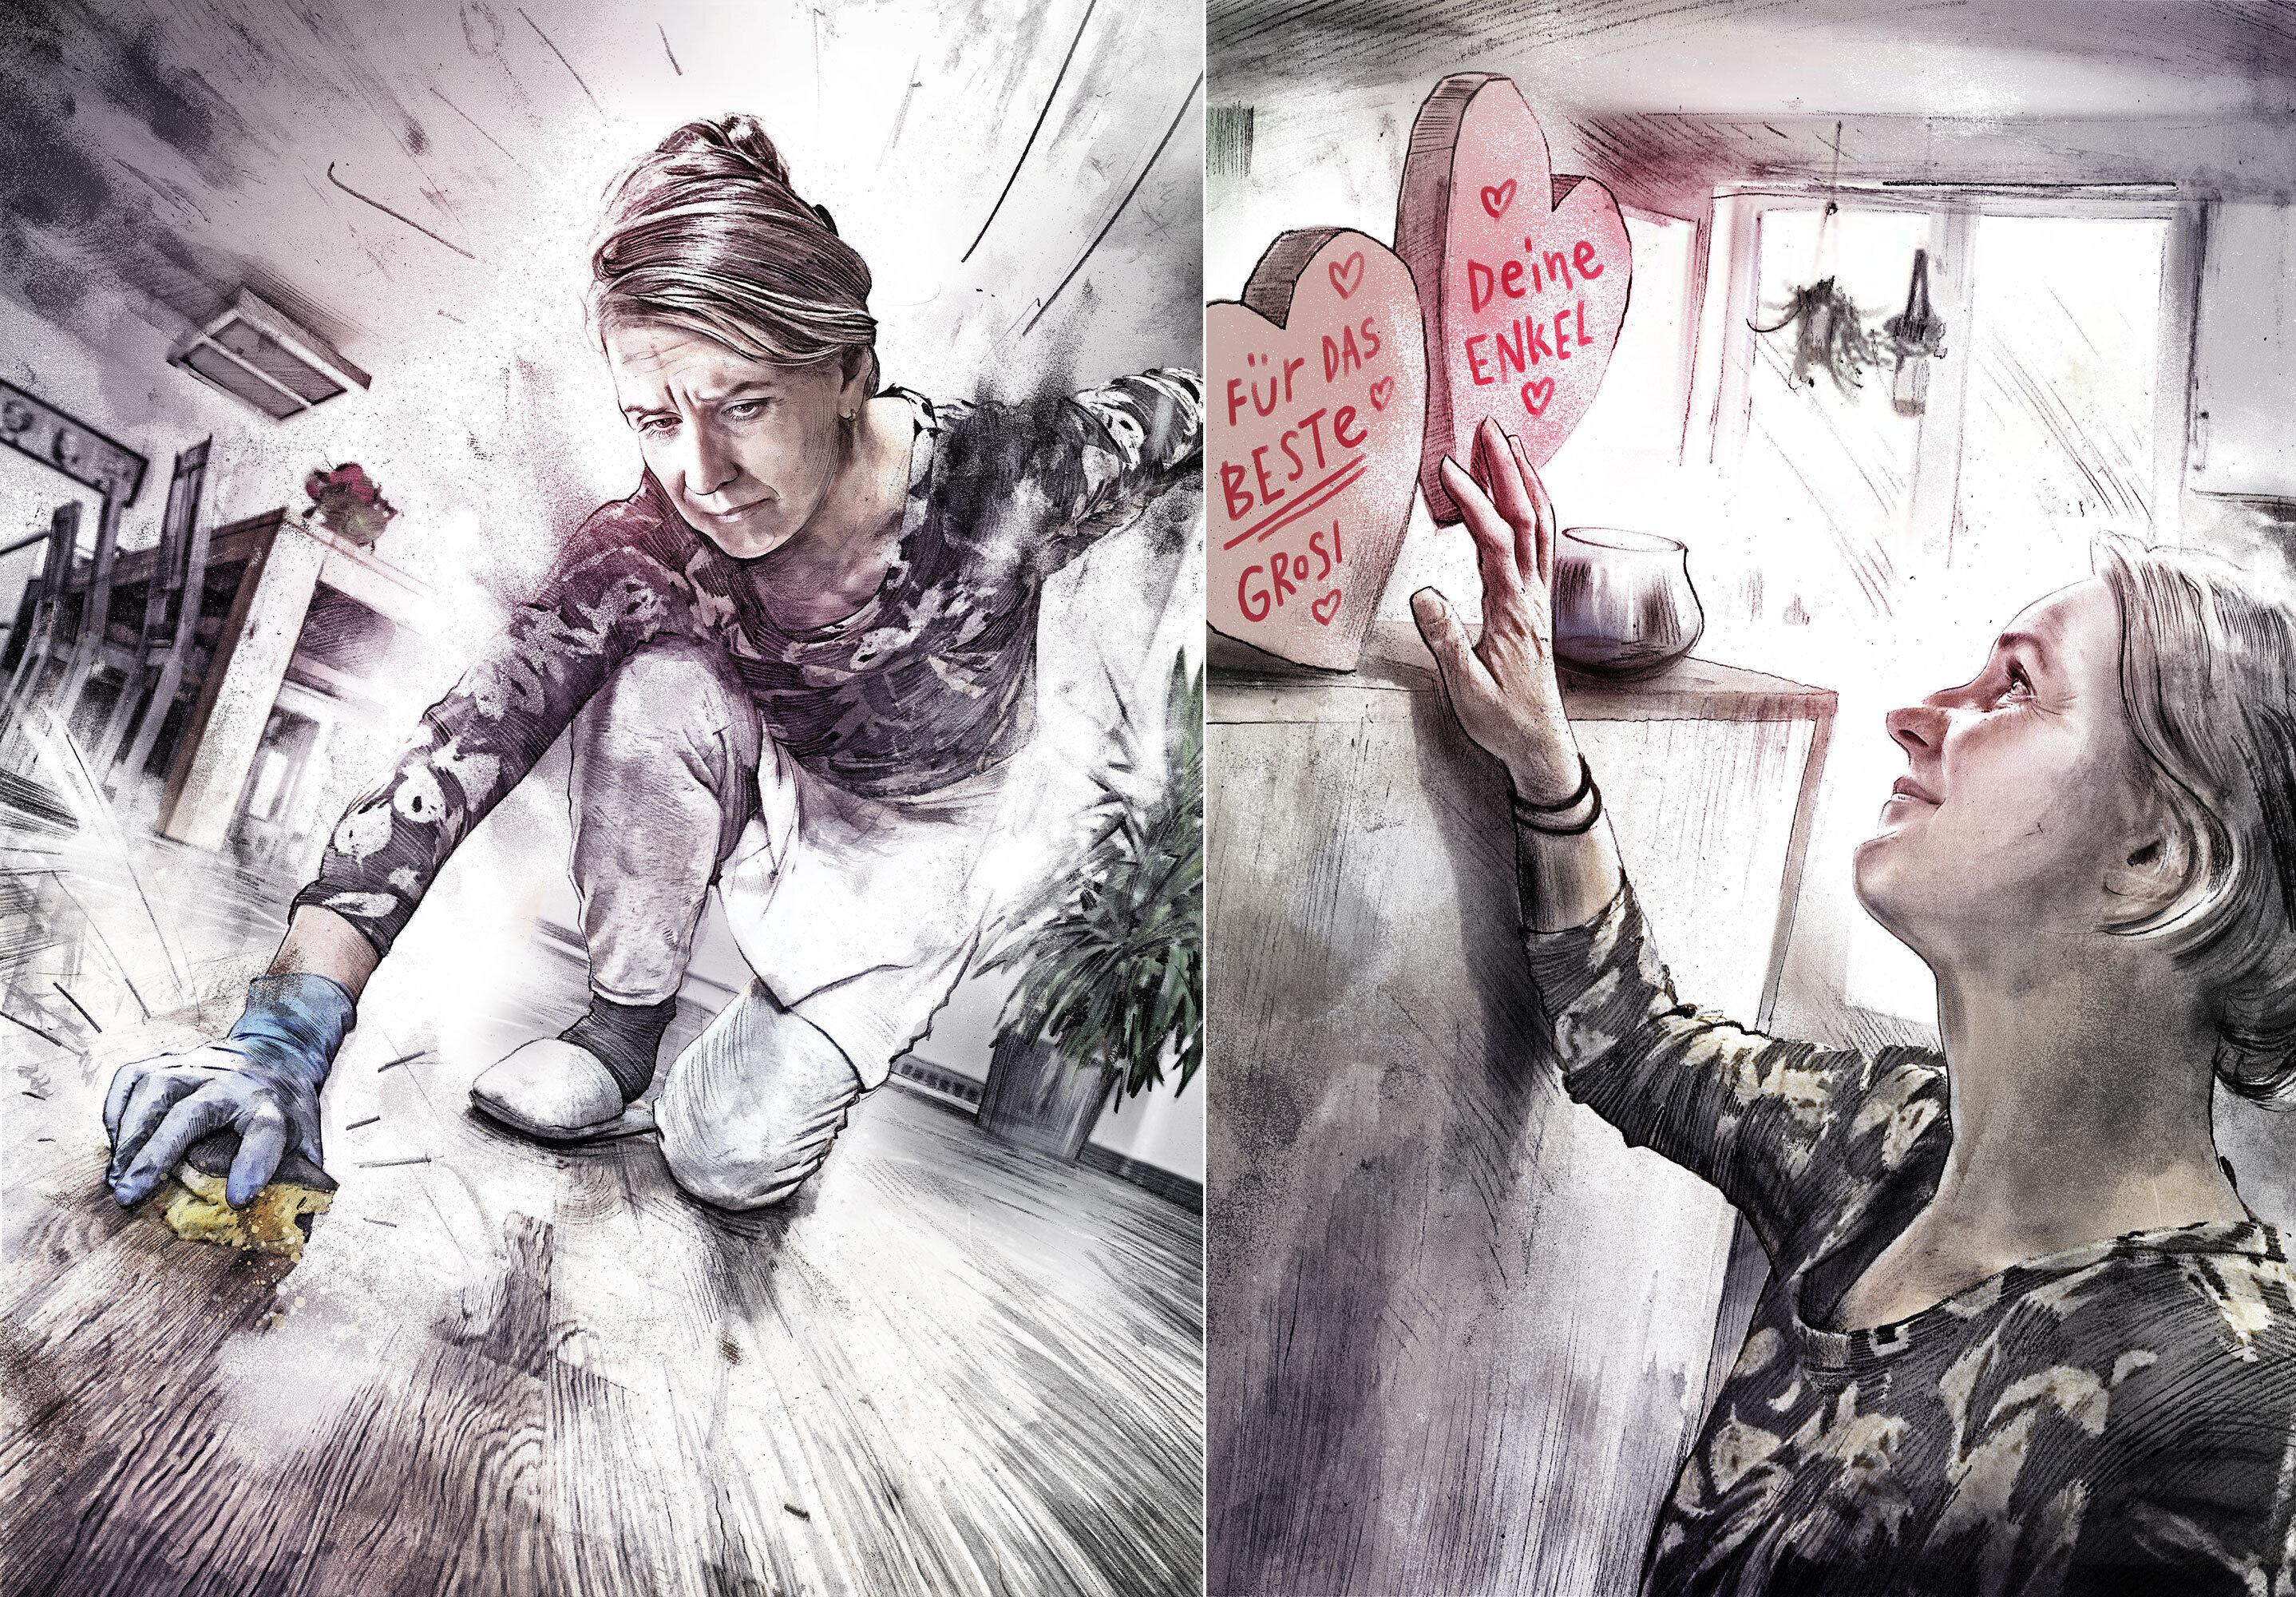 Putzfrau - Kornel Illustration | Kornel Stadler portfolio